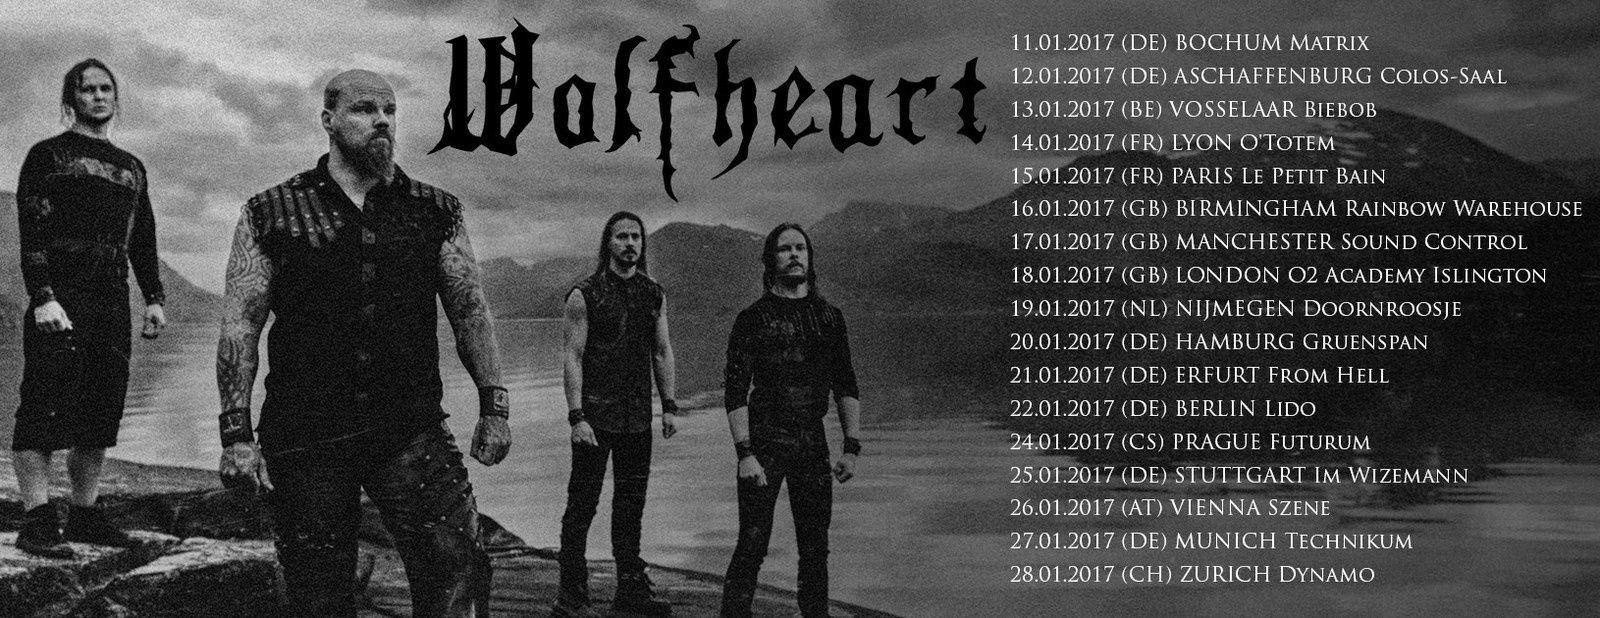 WOLFHEART tourdates and new album